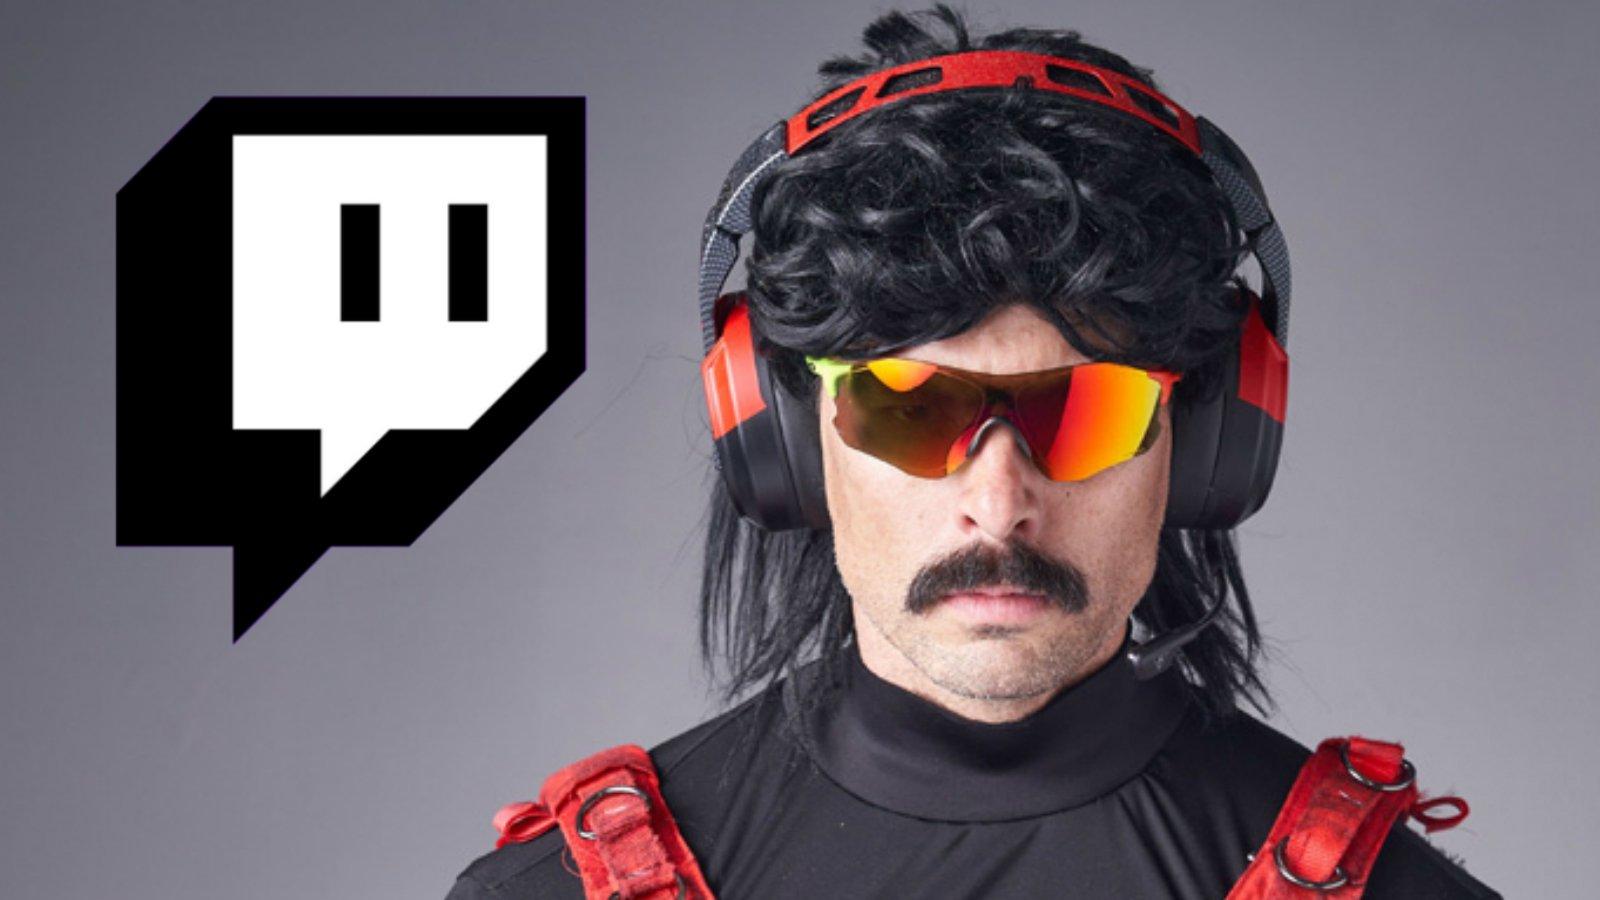 O Dr.Disrespect finalmente, depois de tanto tempo, quebrou o silêncio sobre seu banimento na Twitch e fala tudo sobre o ocorrido.